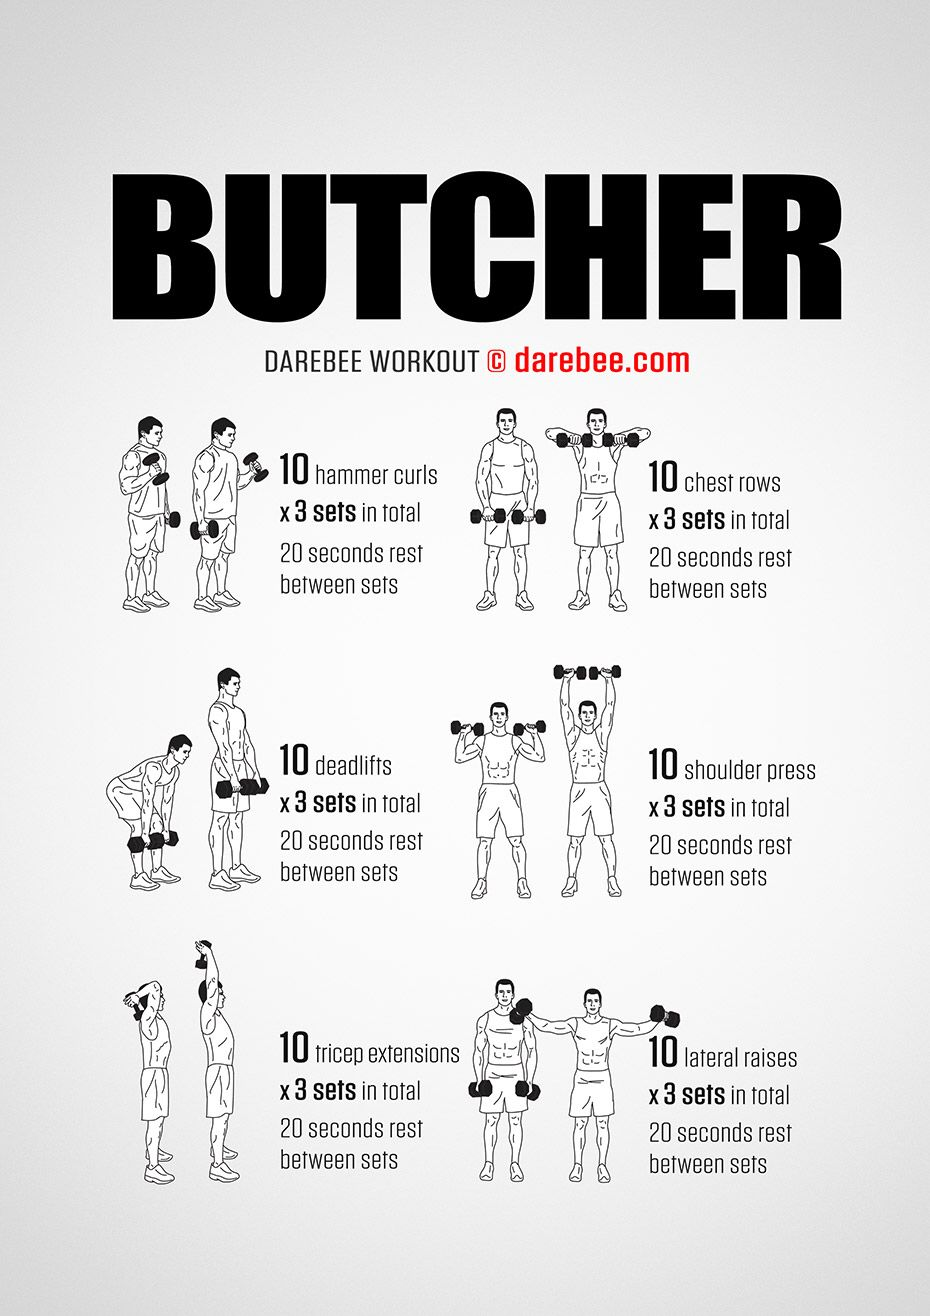 DAREBEE on Warrior workout, Superhero workout, Agility